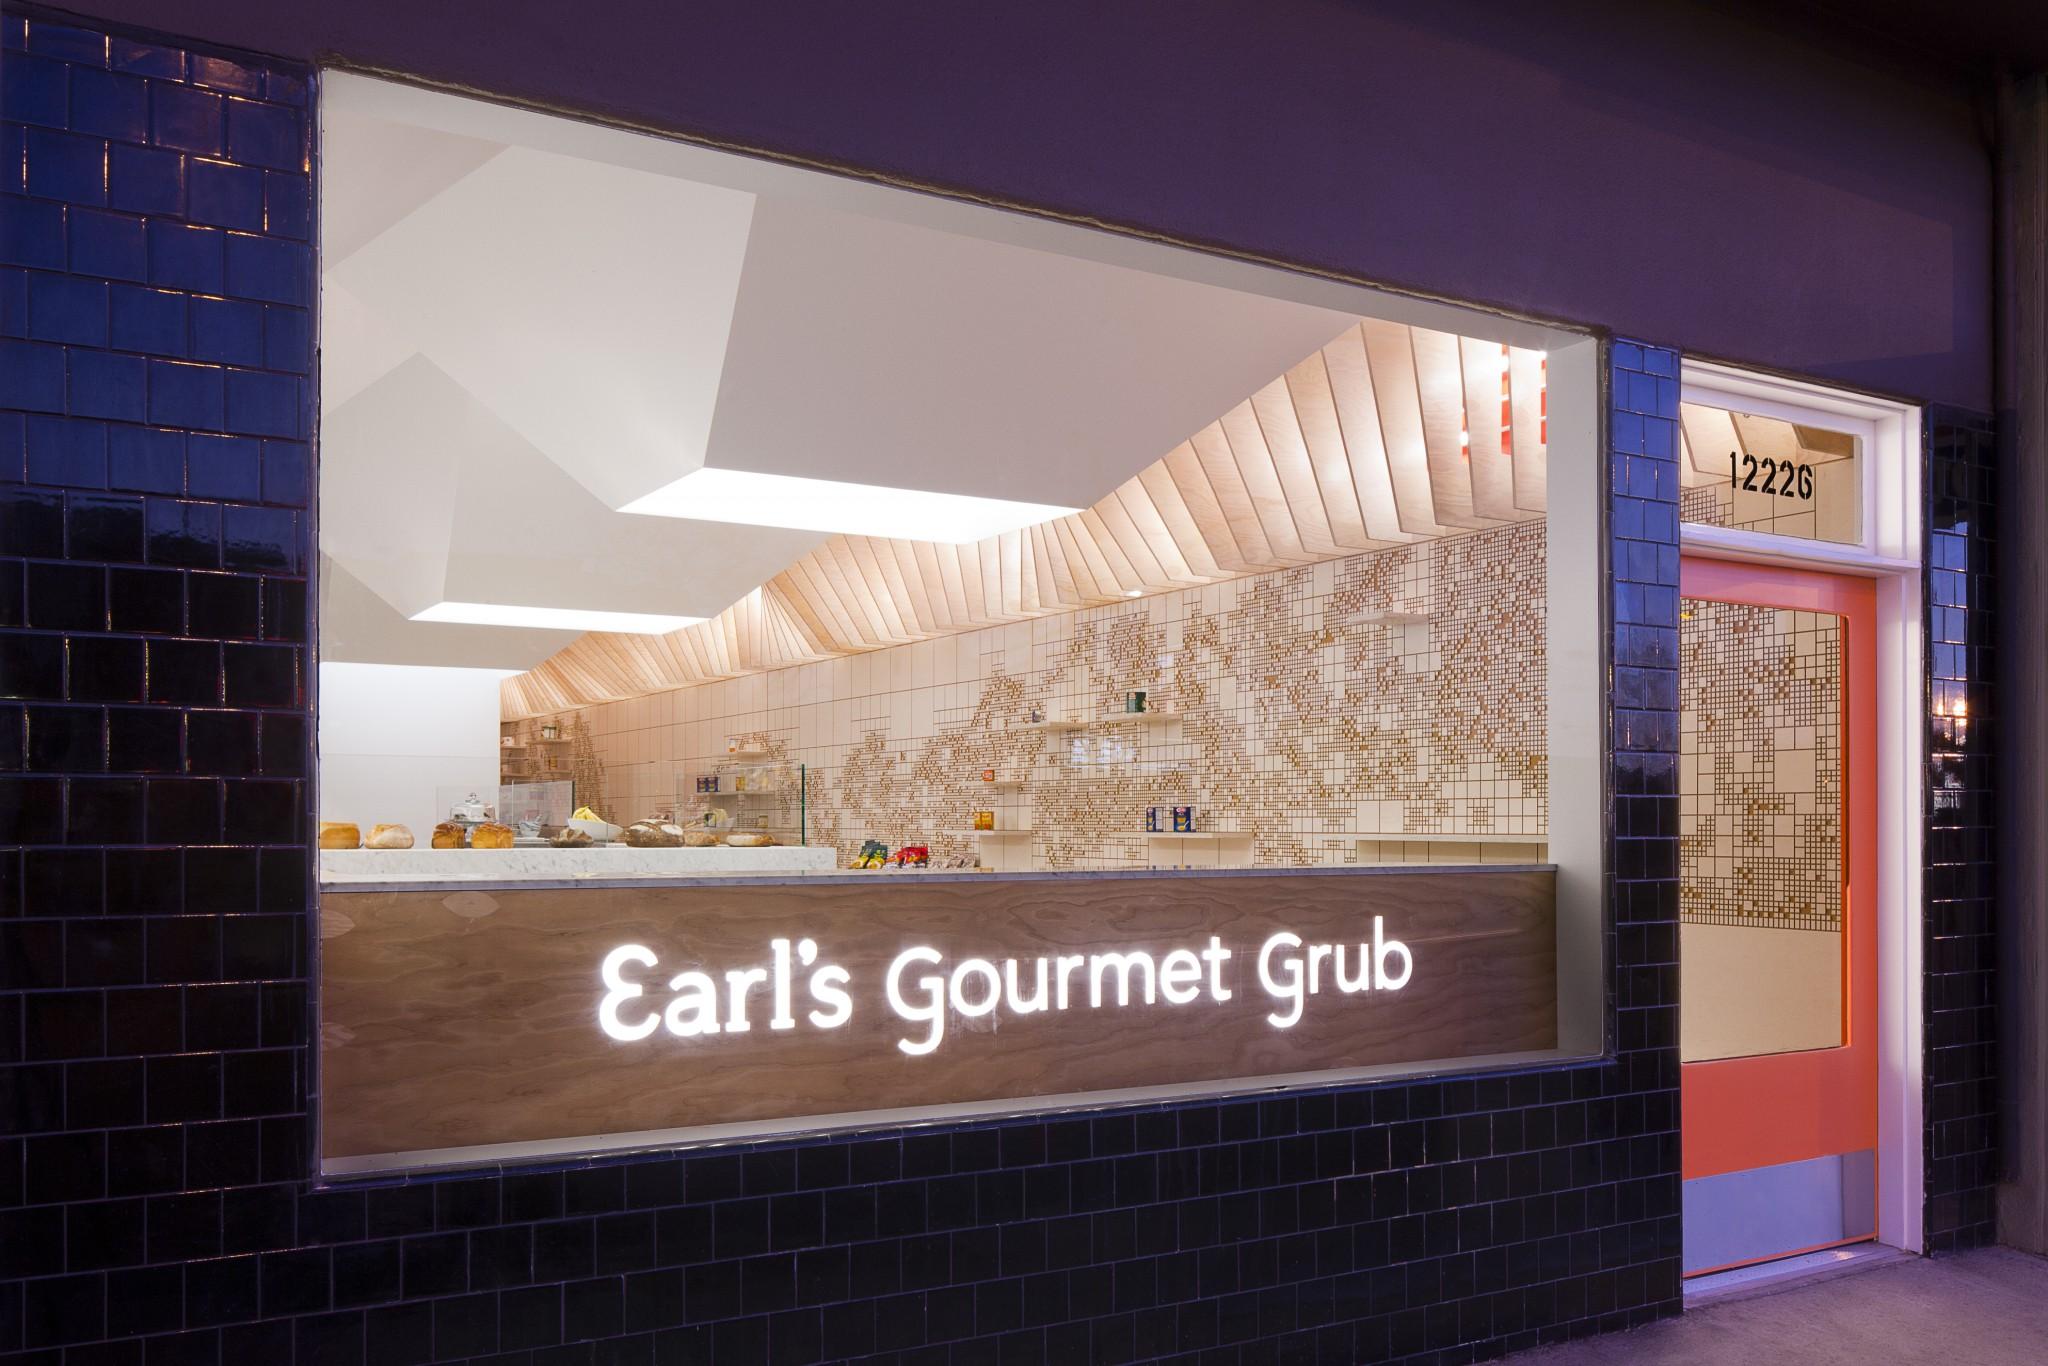 Earl's Gourmet Grub